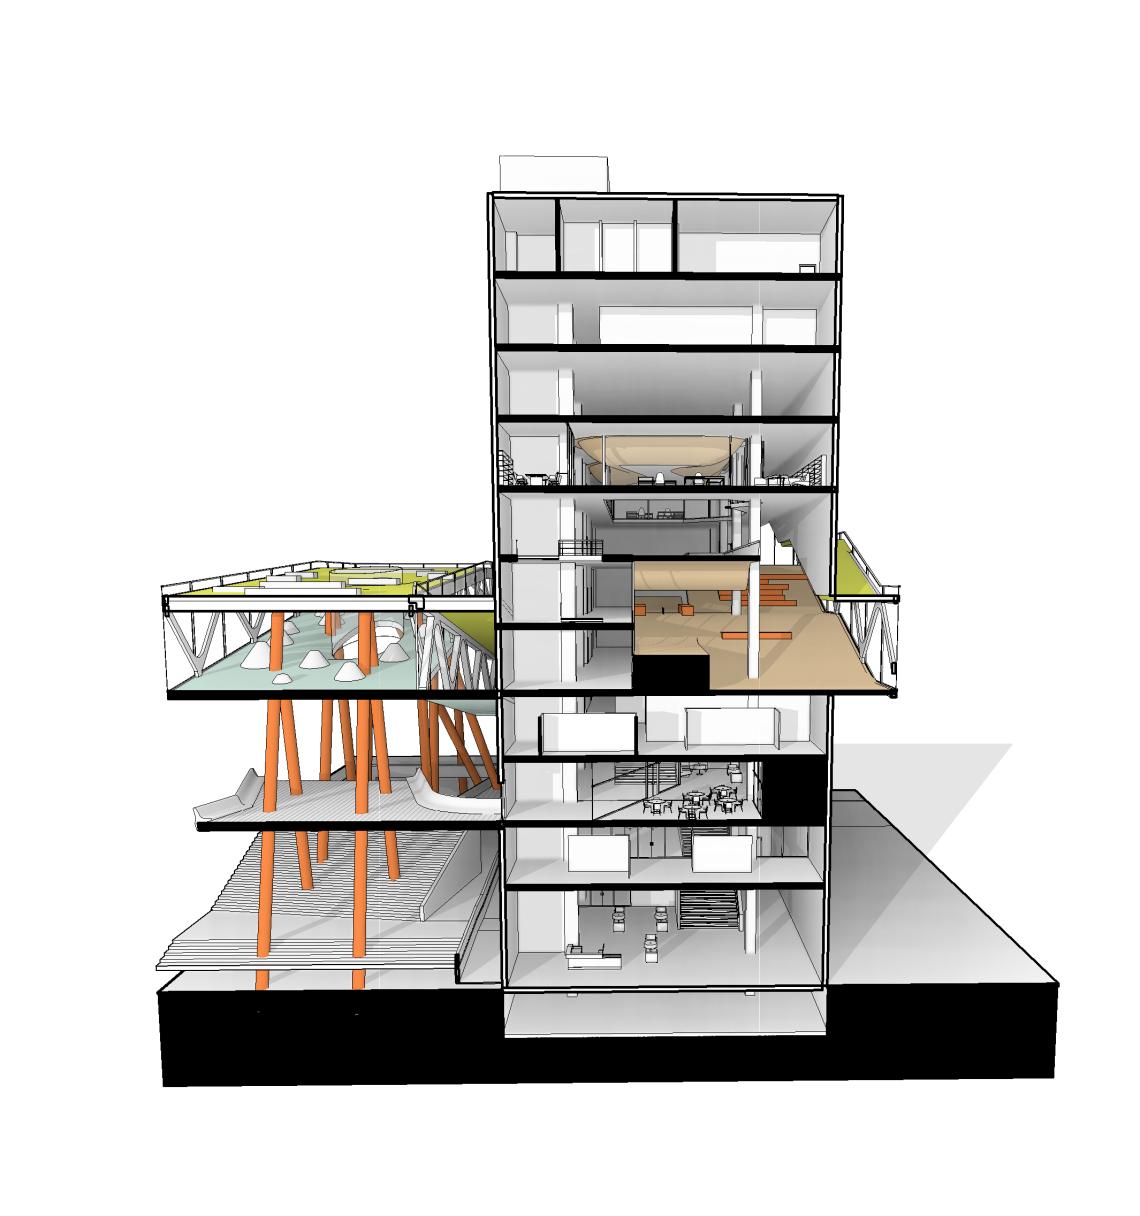 Concept File 3 (revised) - 3D View - Copy of 3D View 4